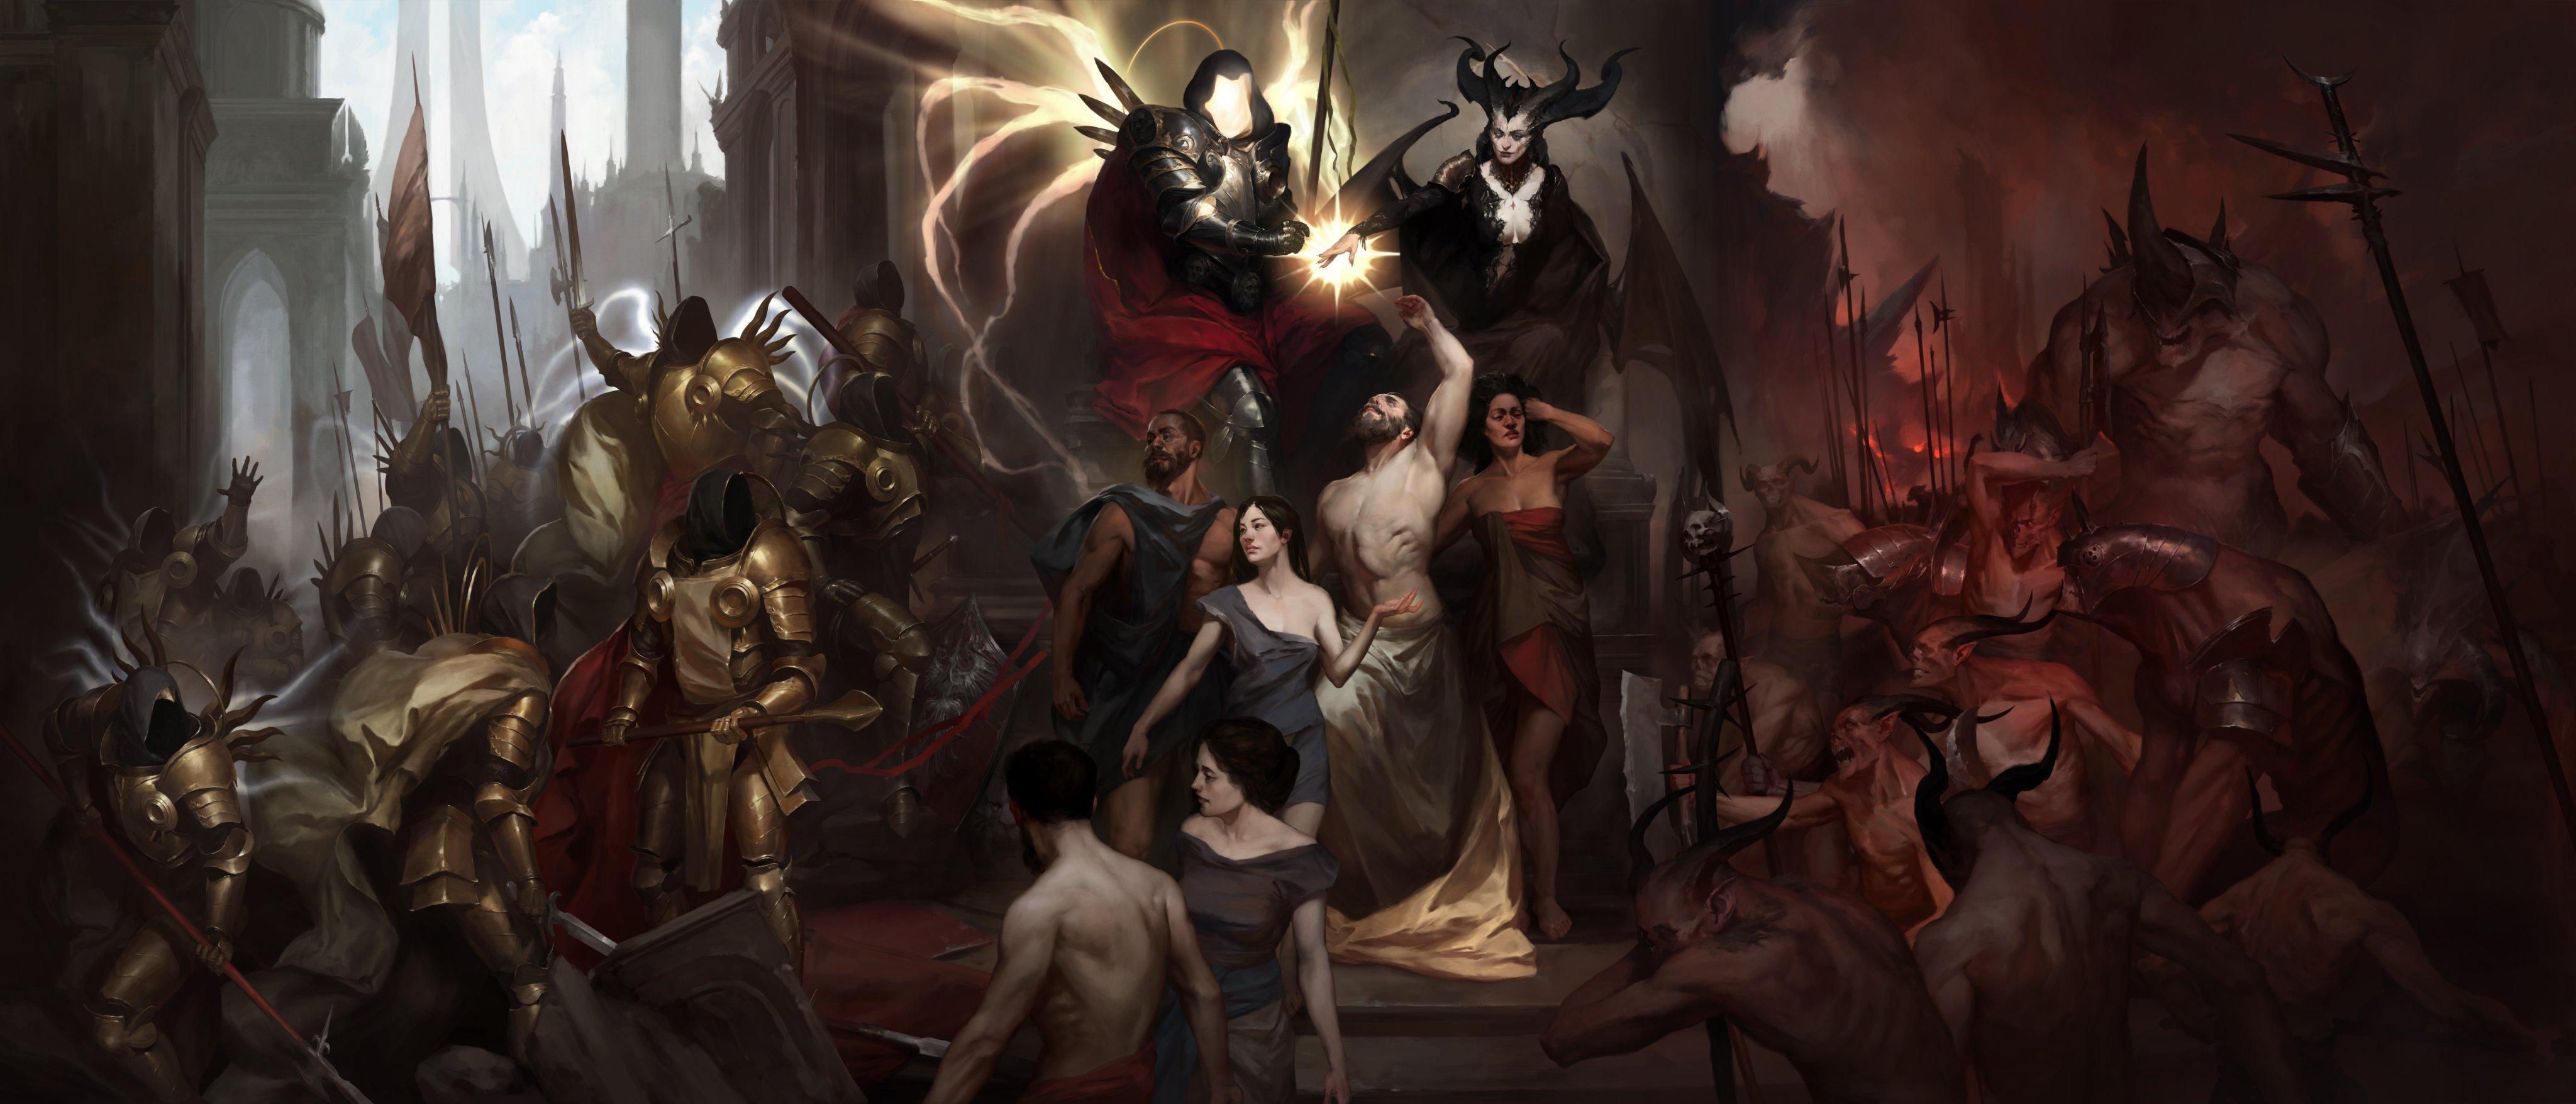 Wallpaper Diablo 4 Video Game Art Blizzard Entertainment 4096x1755 Rswol 1696399 Hd Wallpapers Wallhere